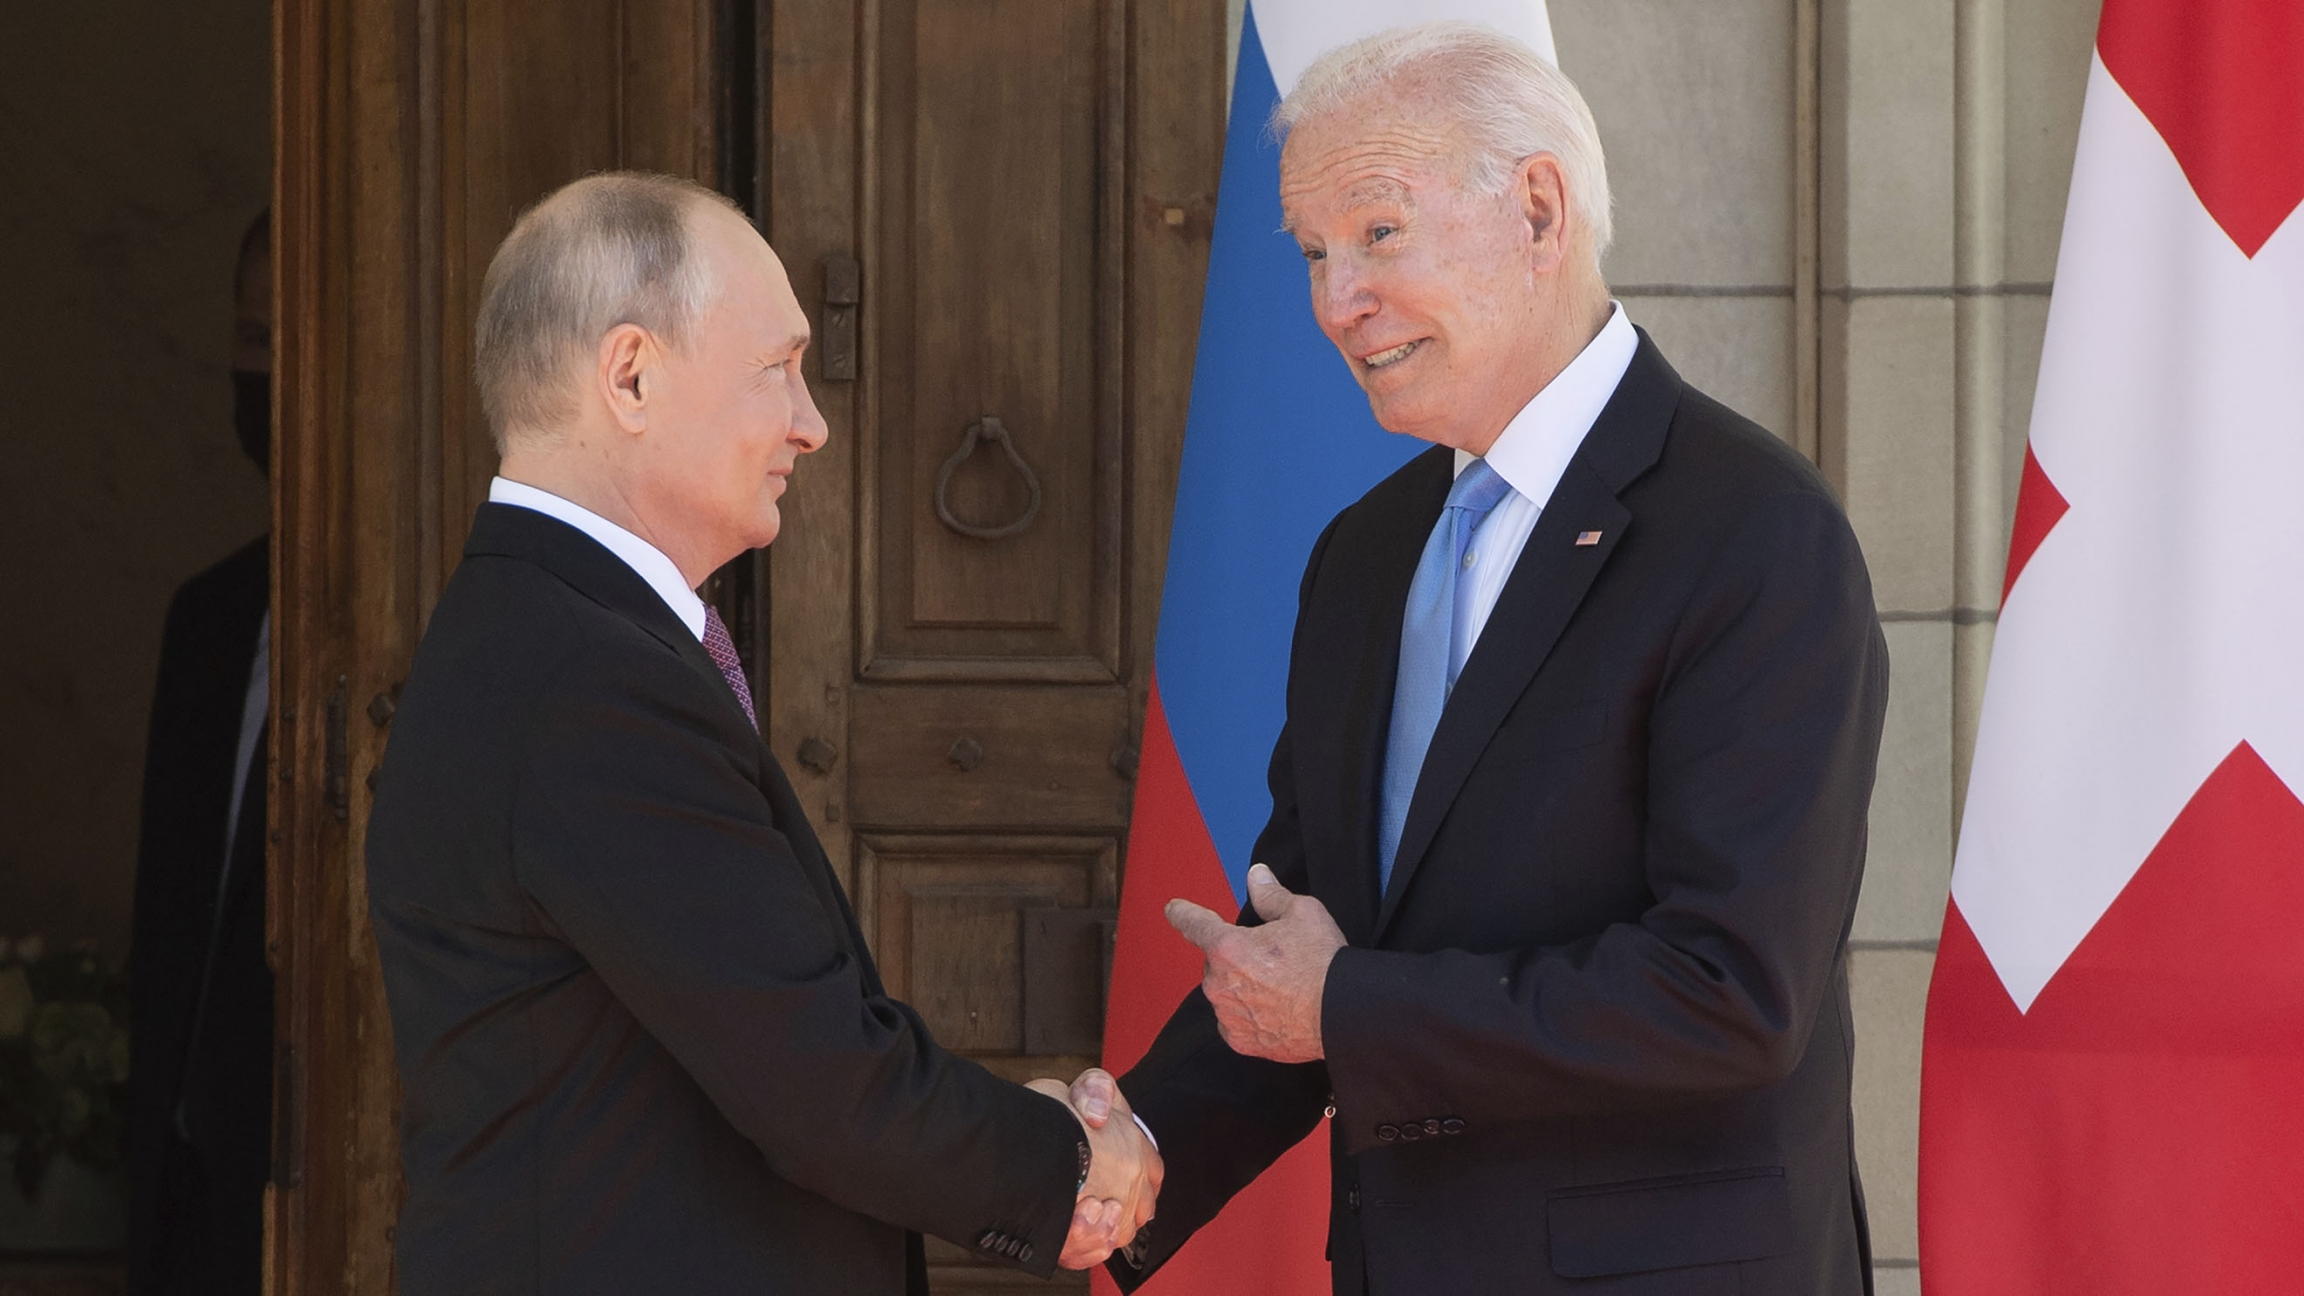 President Joe Biden and Russian President Vladimir Putin, arrive to meet at the Villa la Grange, Wednesday, June 16, 2021, in Geneva, Switzerland.